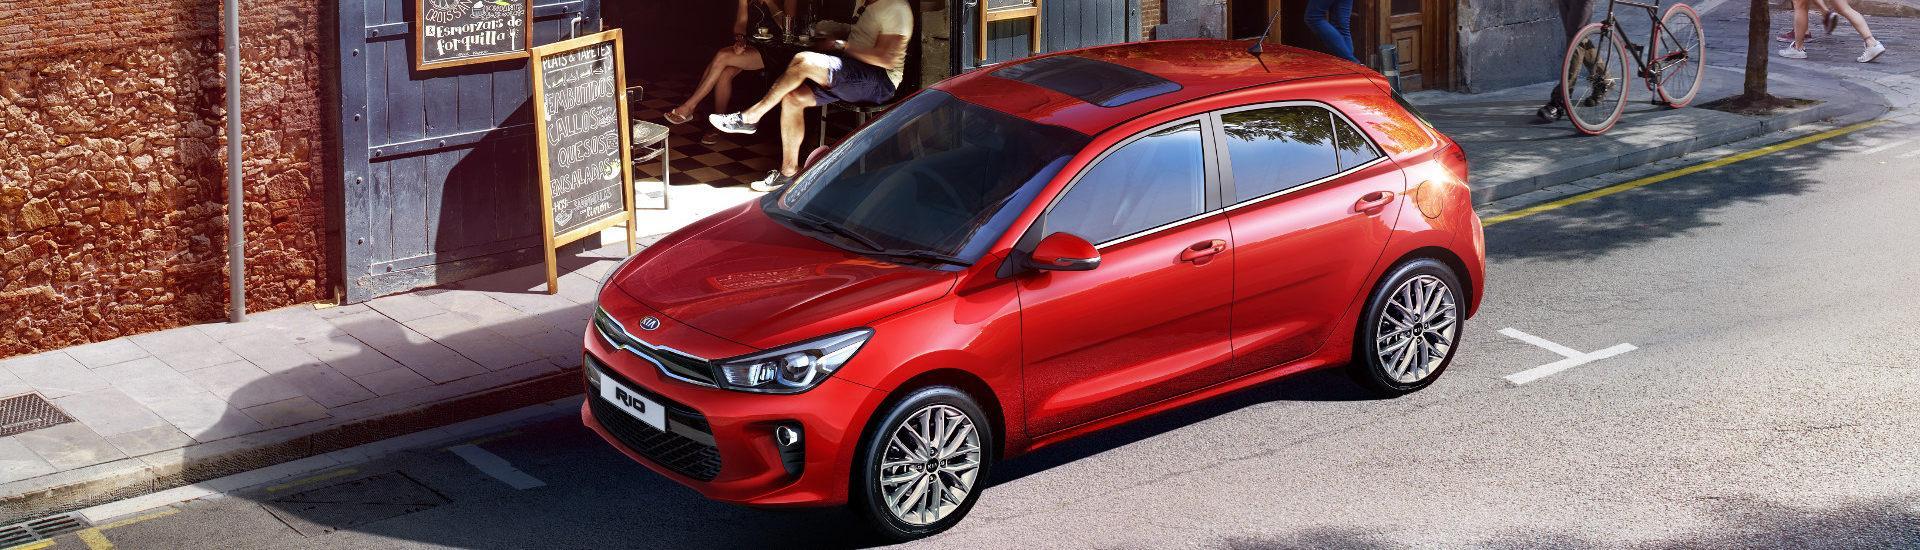 New Kia Rio Hatch Cars For Sale Carsales Com Au